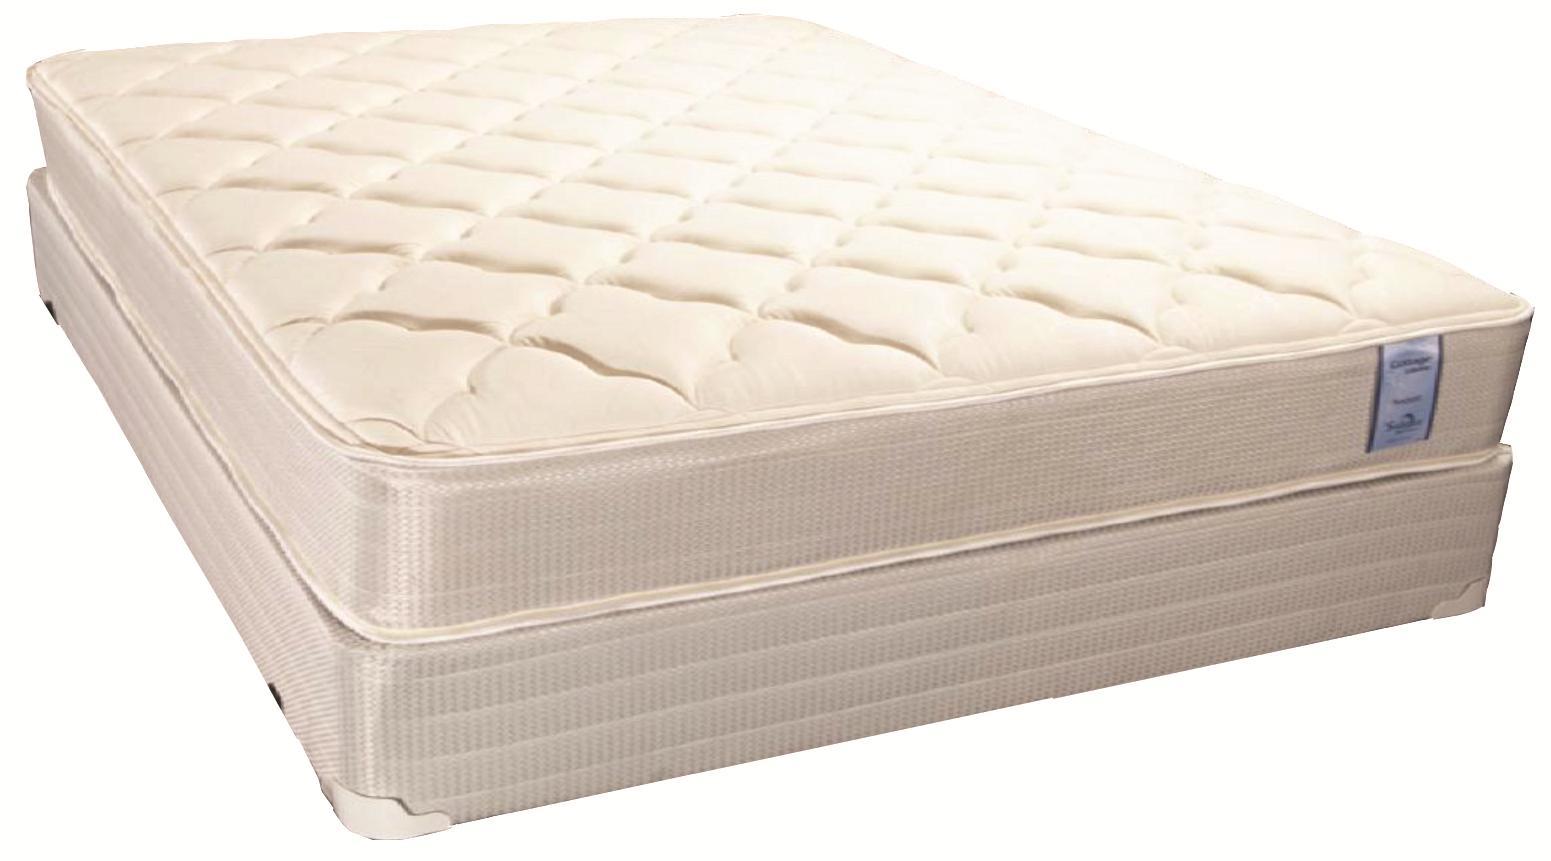 Brockton Twin Plush Mattress Set by Solstice Sleep Products at Virginia Furniture Market